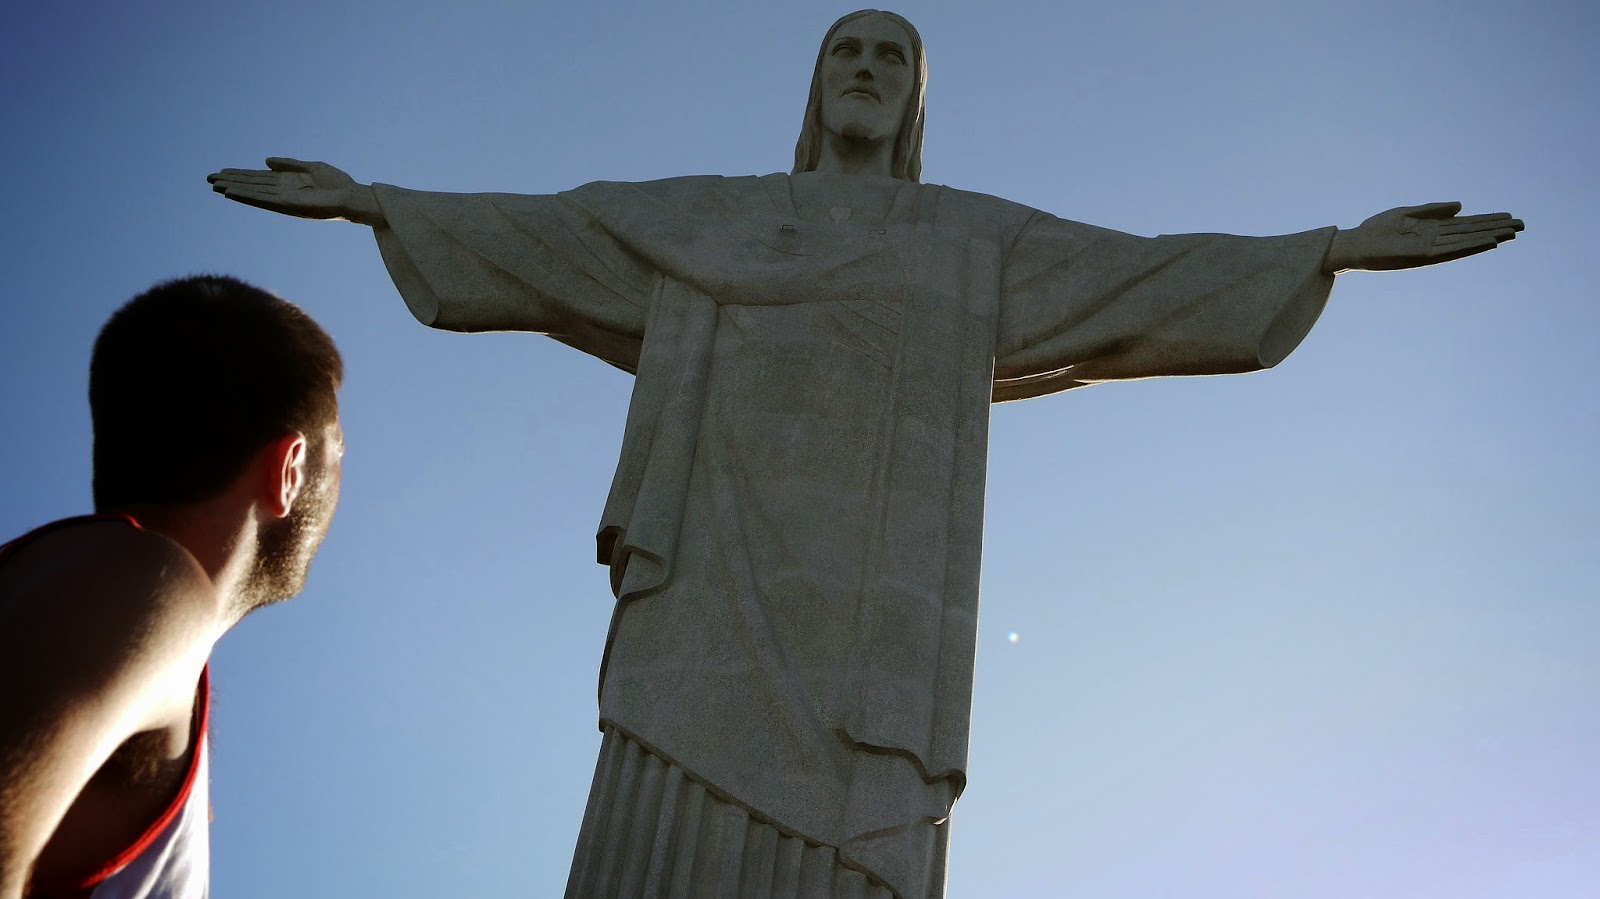 Guy looking at Christ the Redeemer Rio de Janeiro